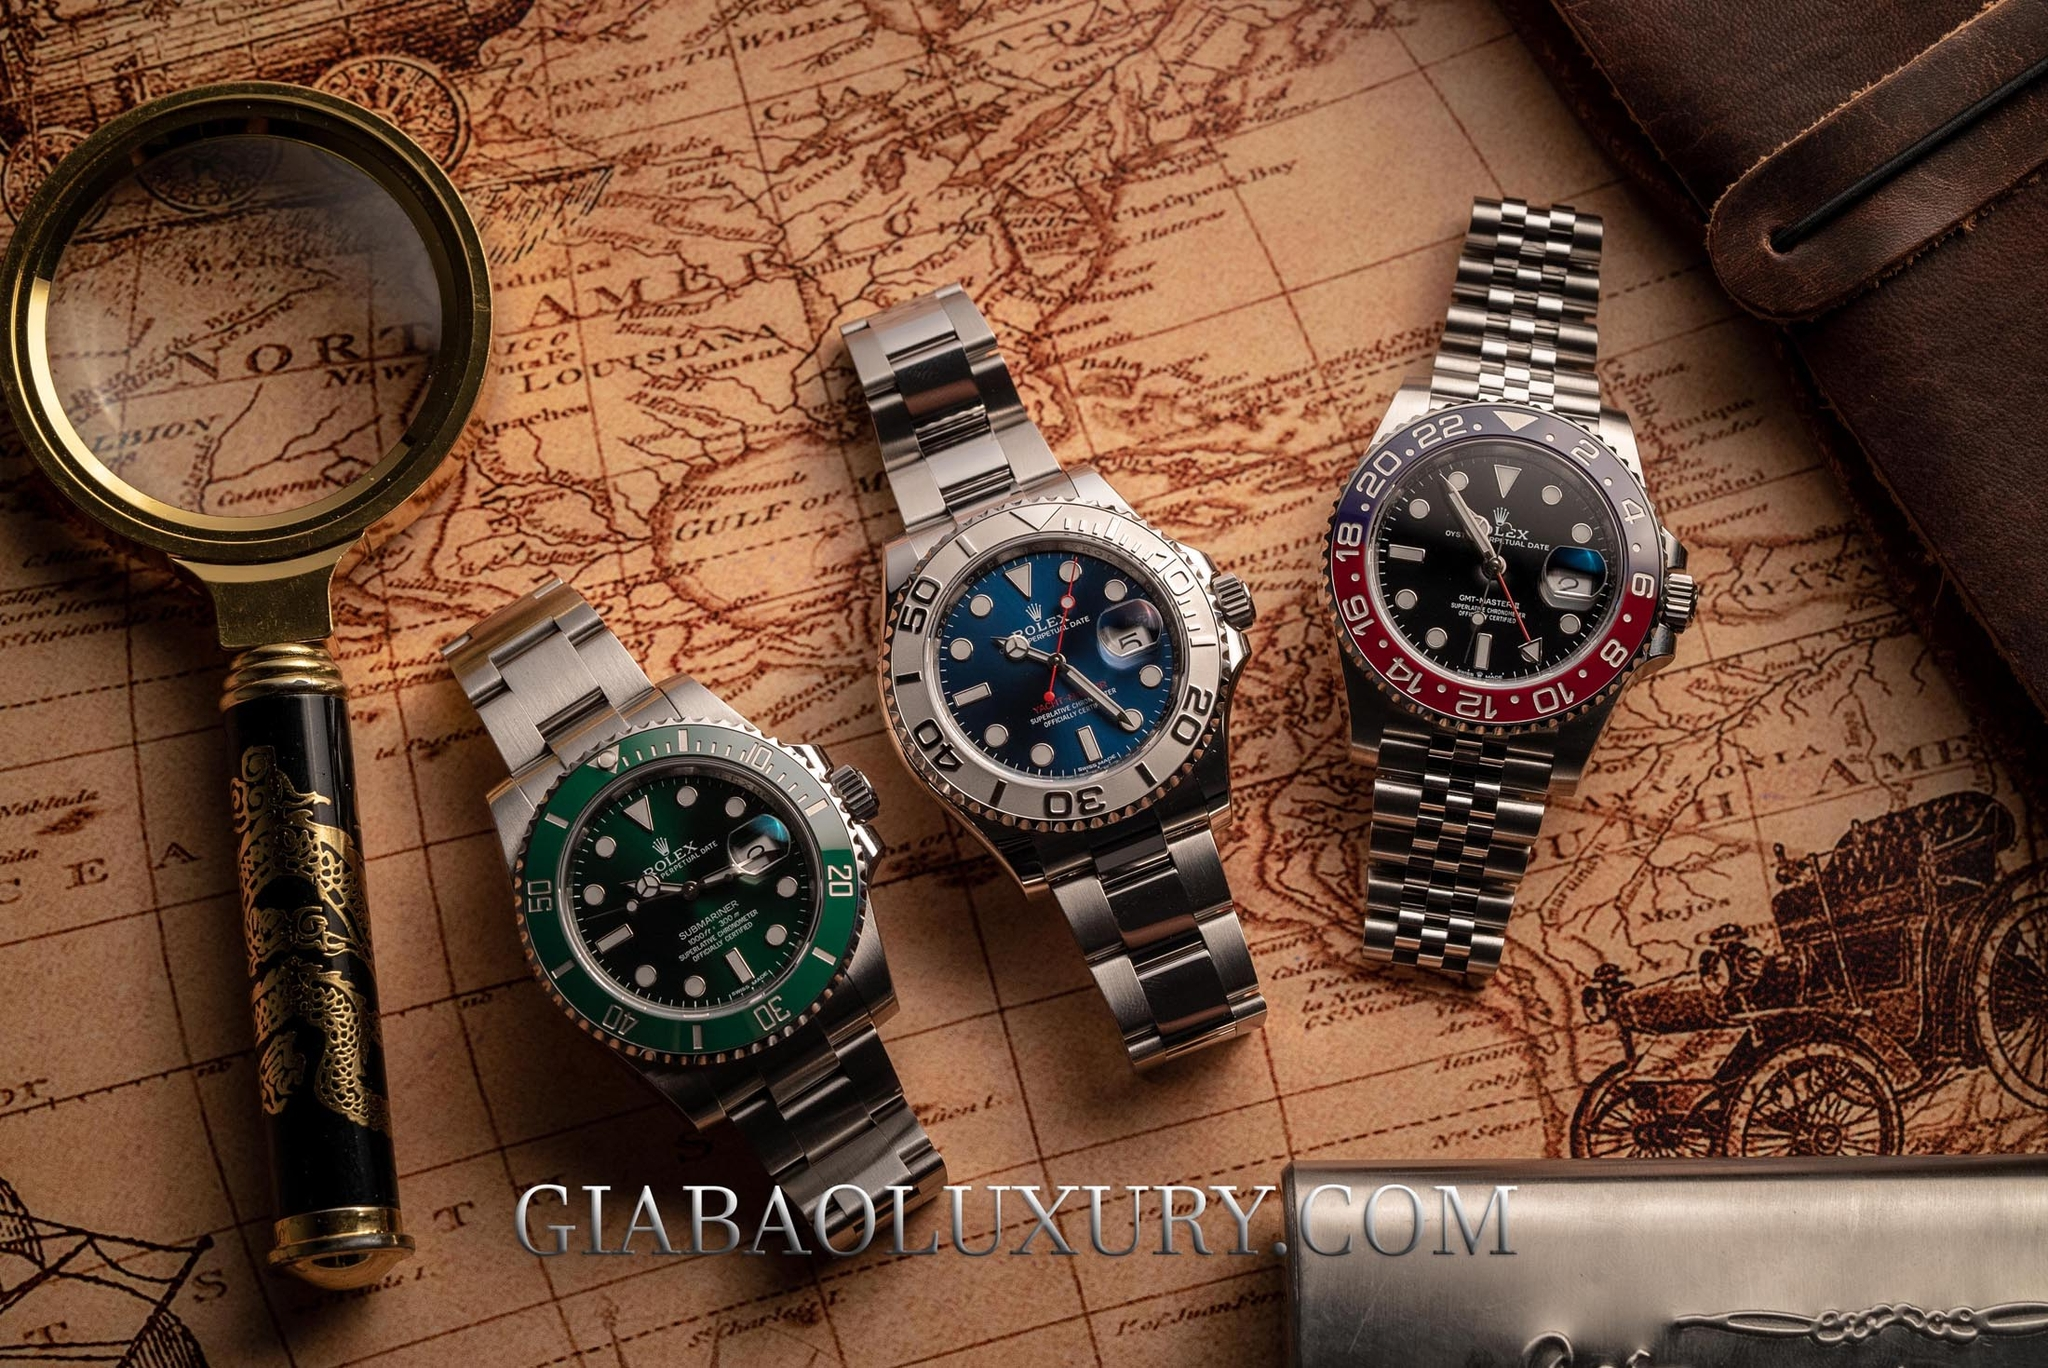 Đồng Hồ Rolex Yacht-Master 116622 Mặt Số Xanh